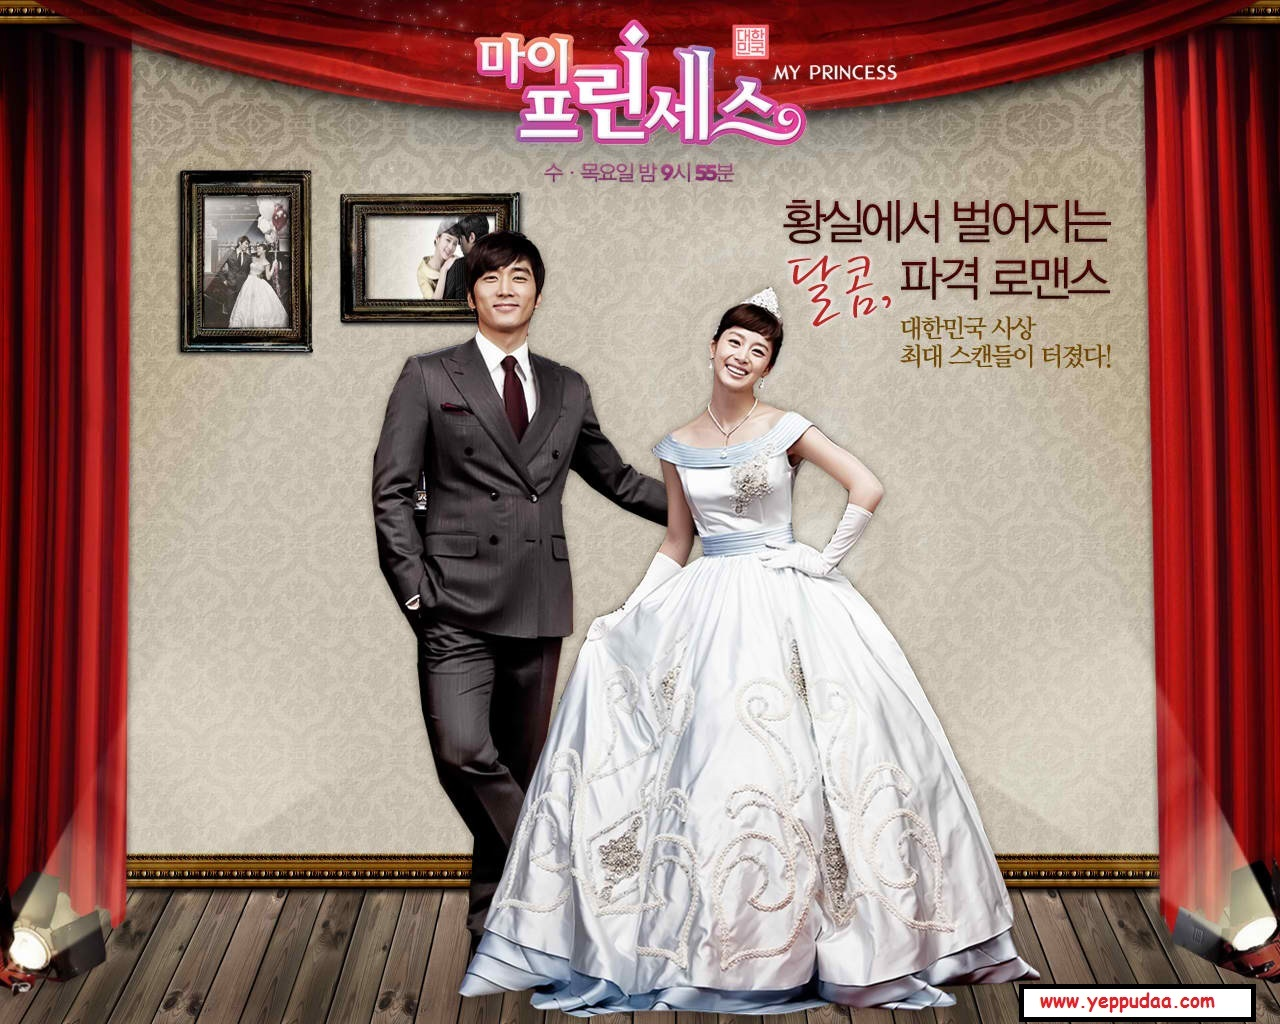 My Princess / Mai Peurinseseu / 2011 / Güney Kore / Online Dizi İzle